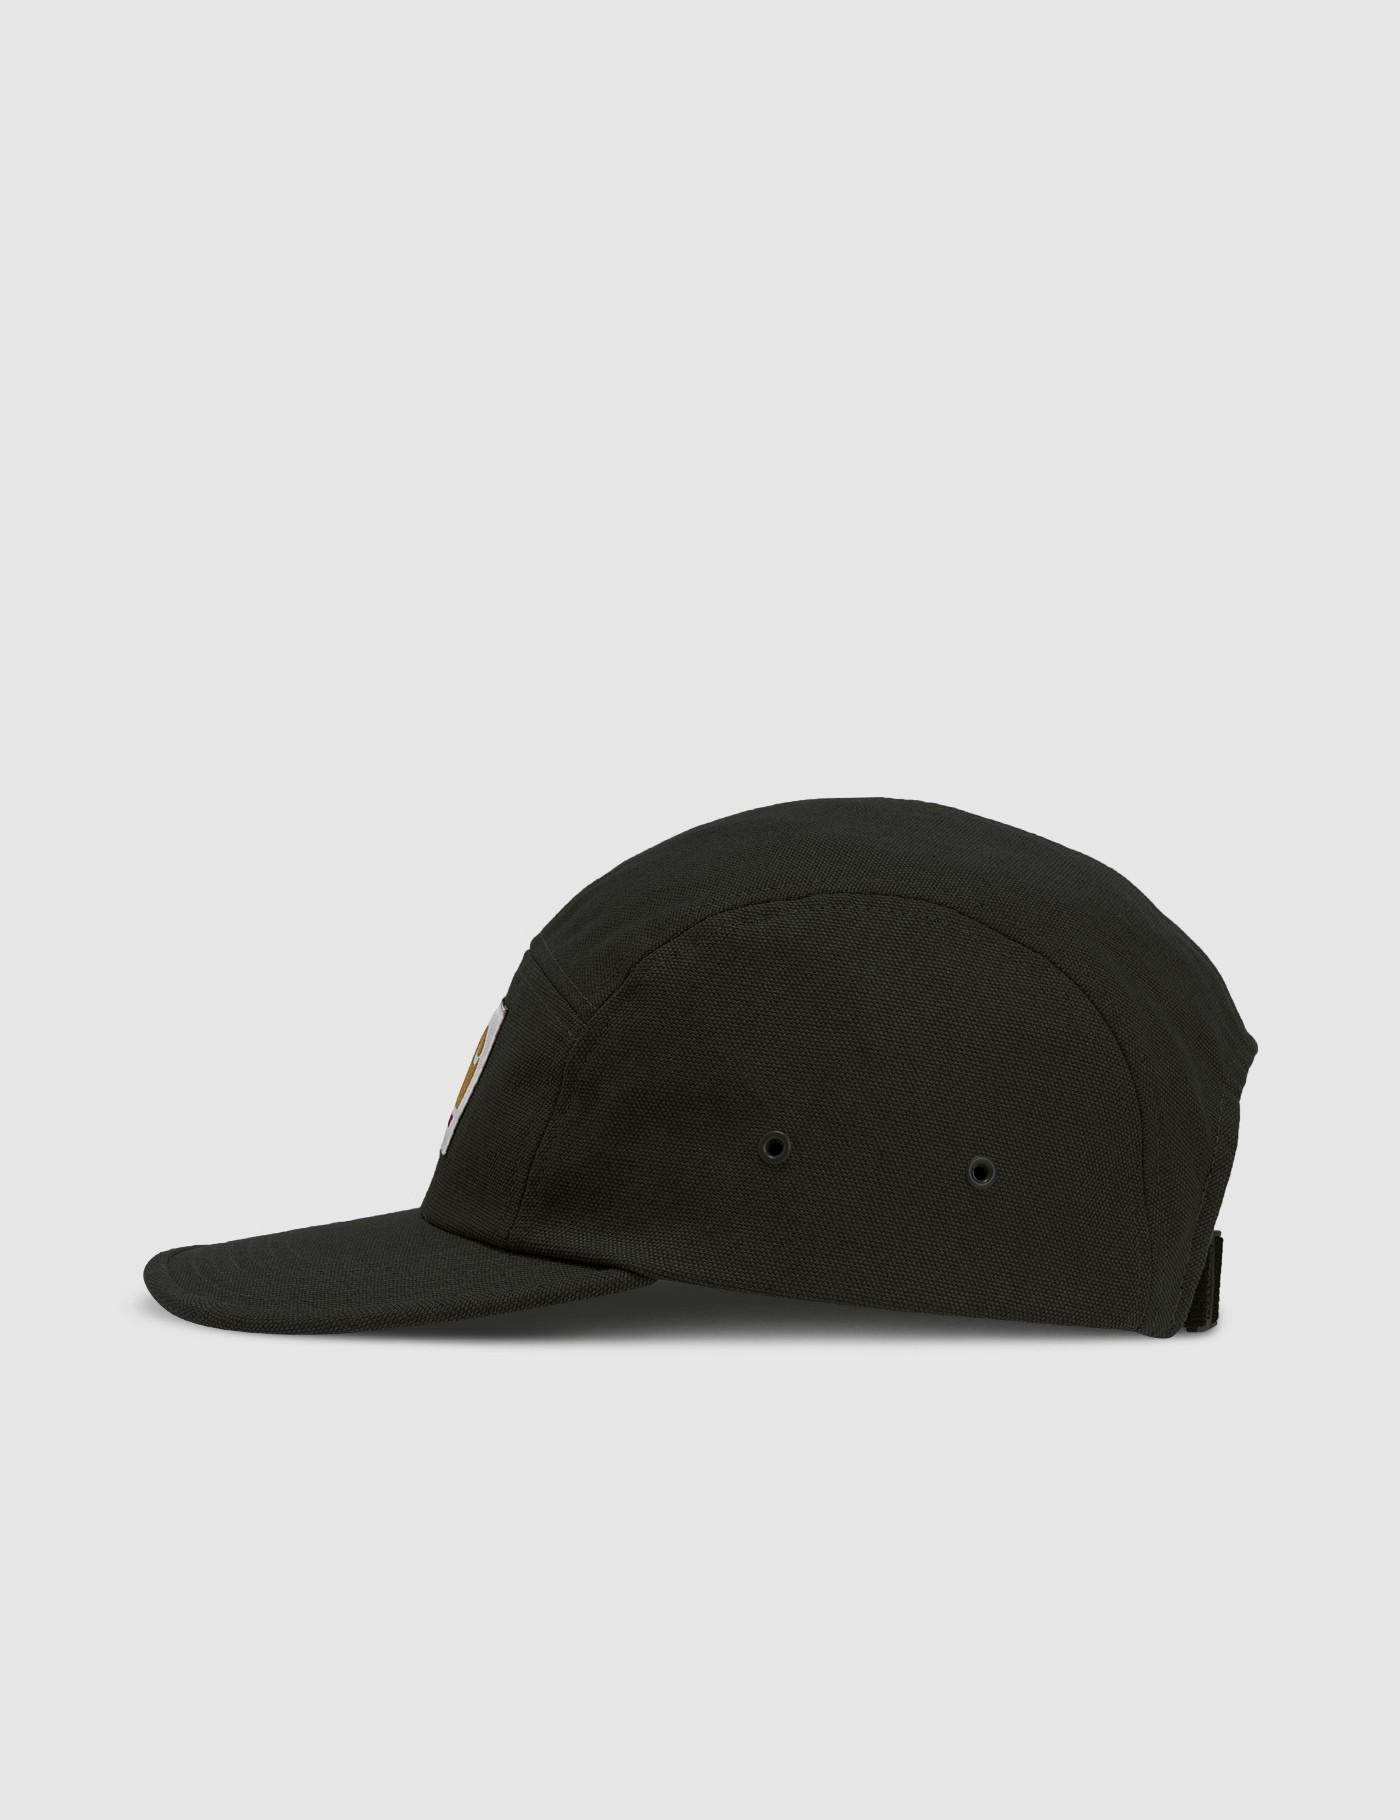 51f9fff0 Lyst - Carhartt WIP Backley Cap in Black for Men